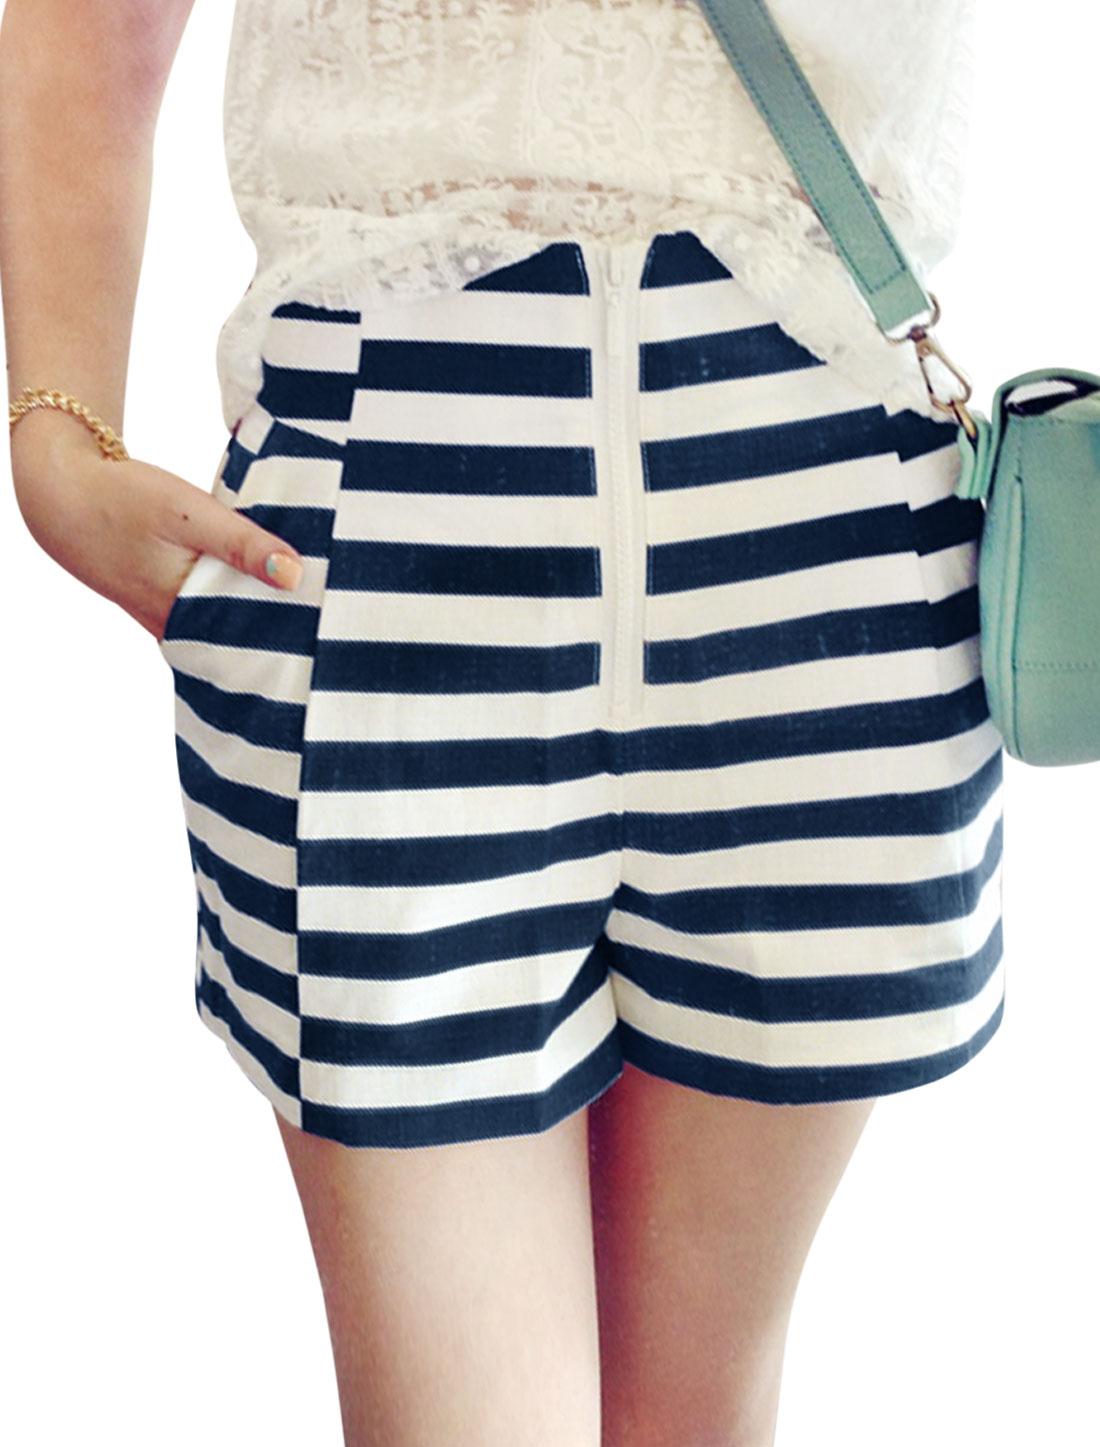 Lady High Waist Zip Fly Stripes Slim Fit Shorts White Dark Blue XS